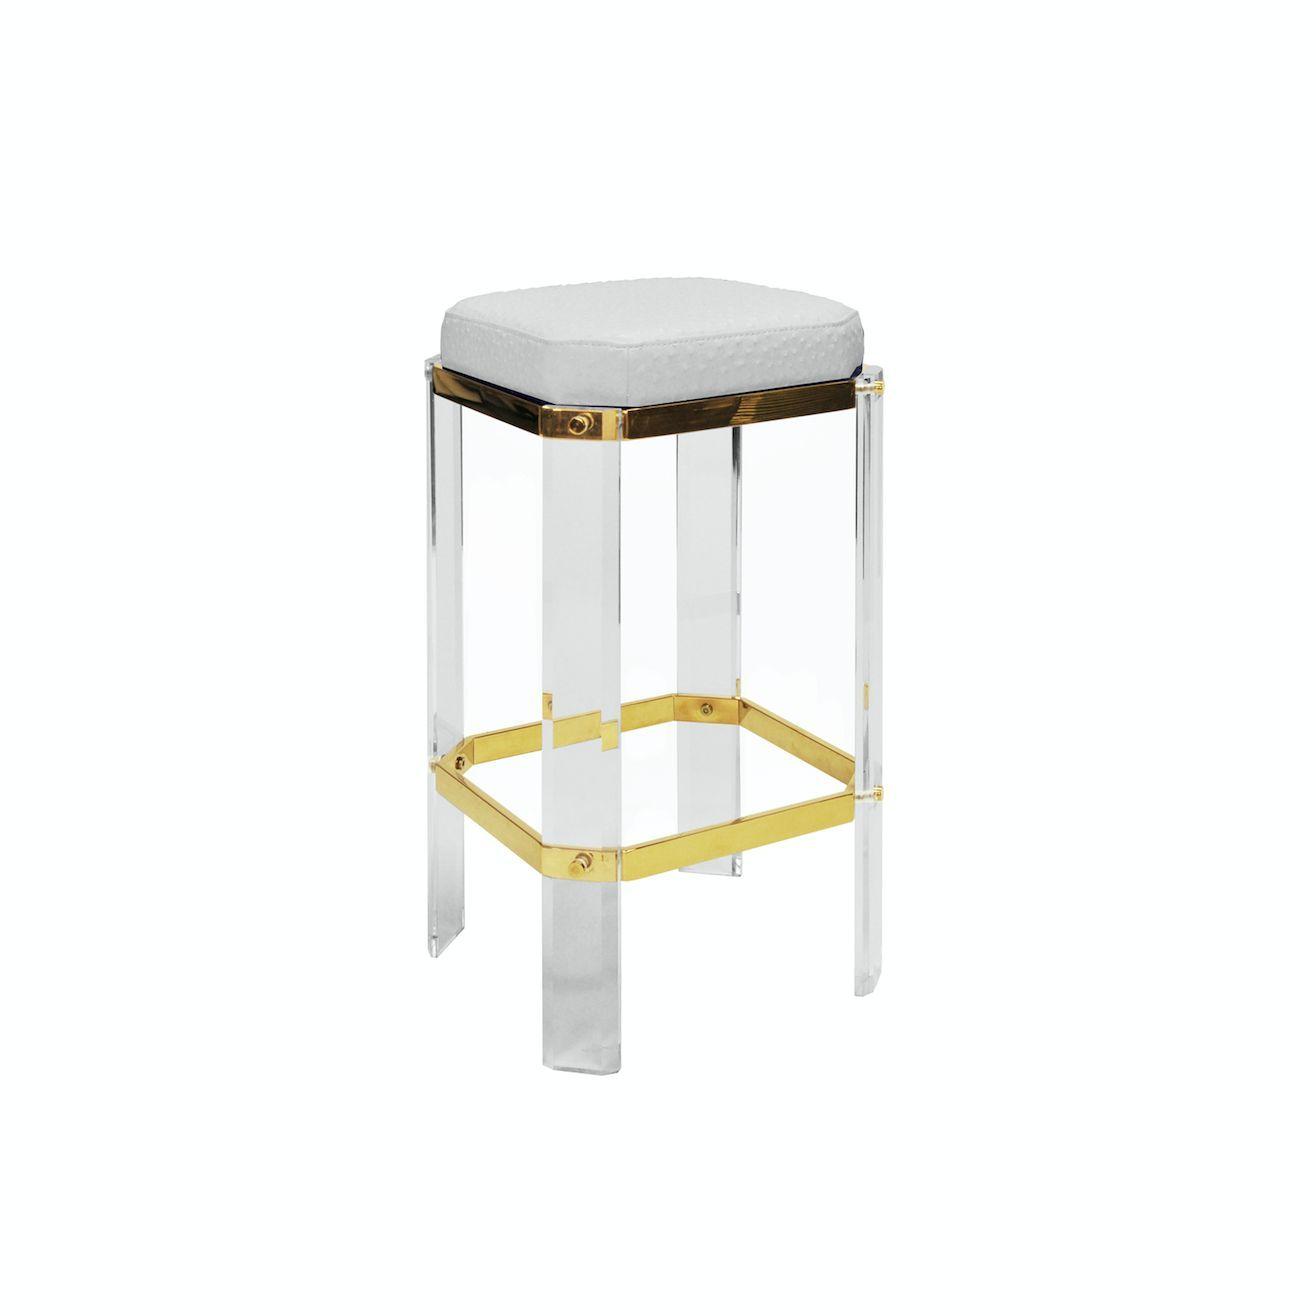 upholstered stools bar acrylic stool counter me photogiraffe padded